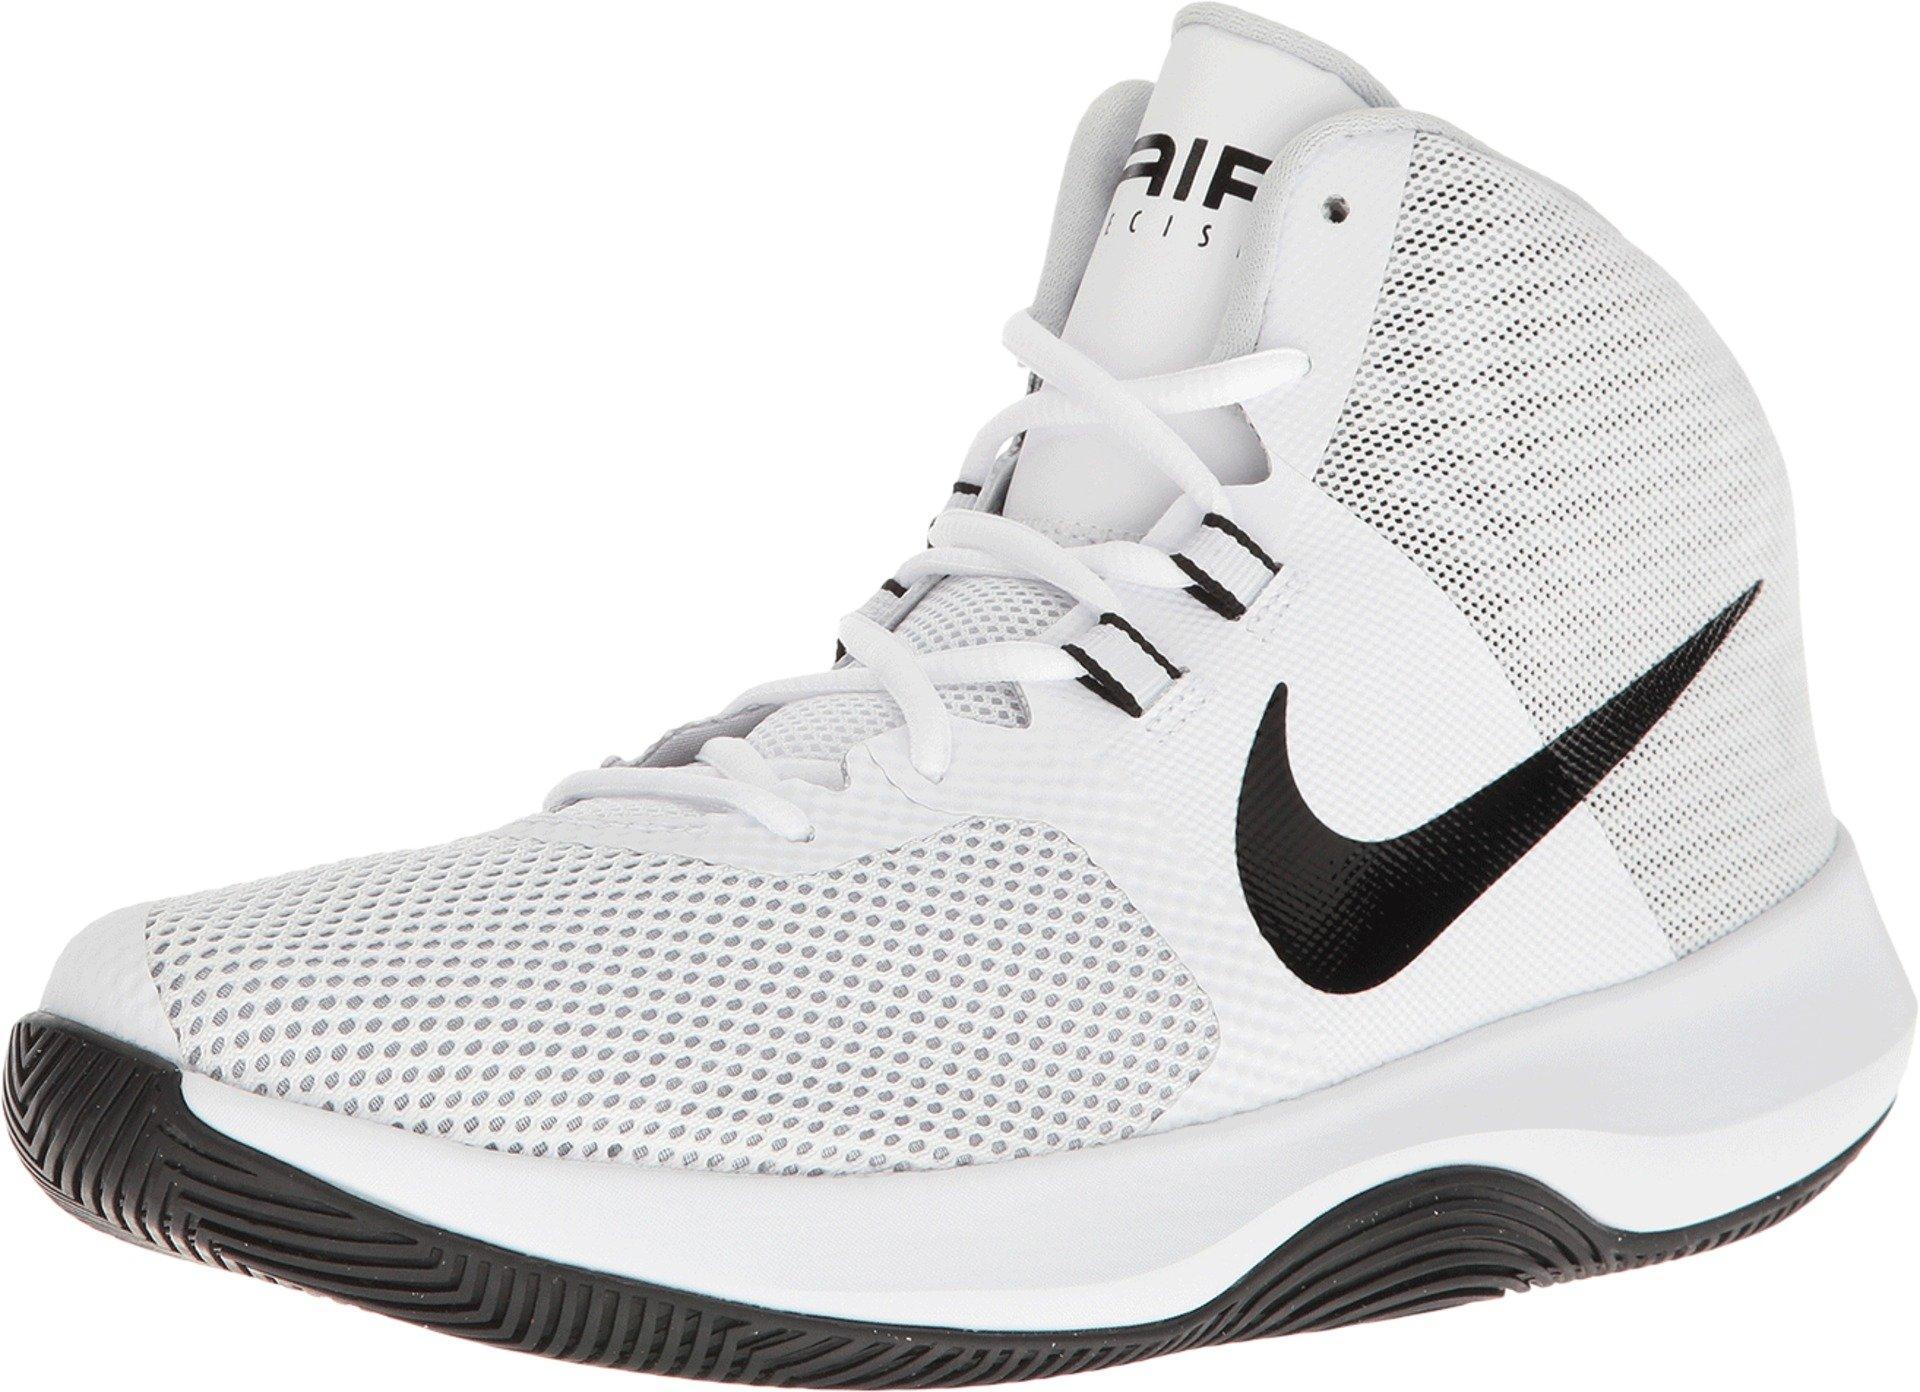 Nike Mens Air Precision Basketball Shoe, White/Black-Cool Grey-Pure Platinum 8